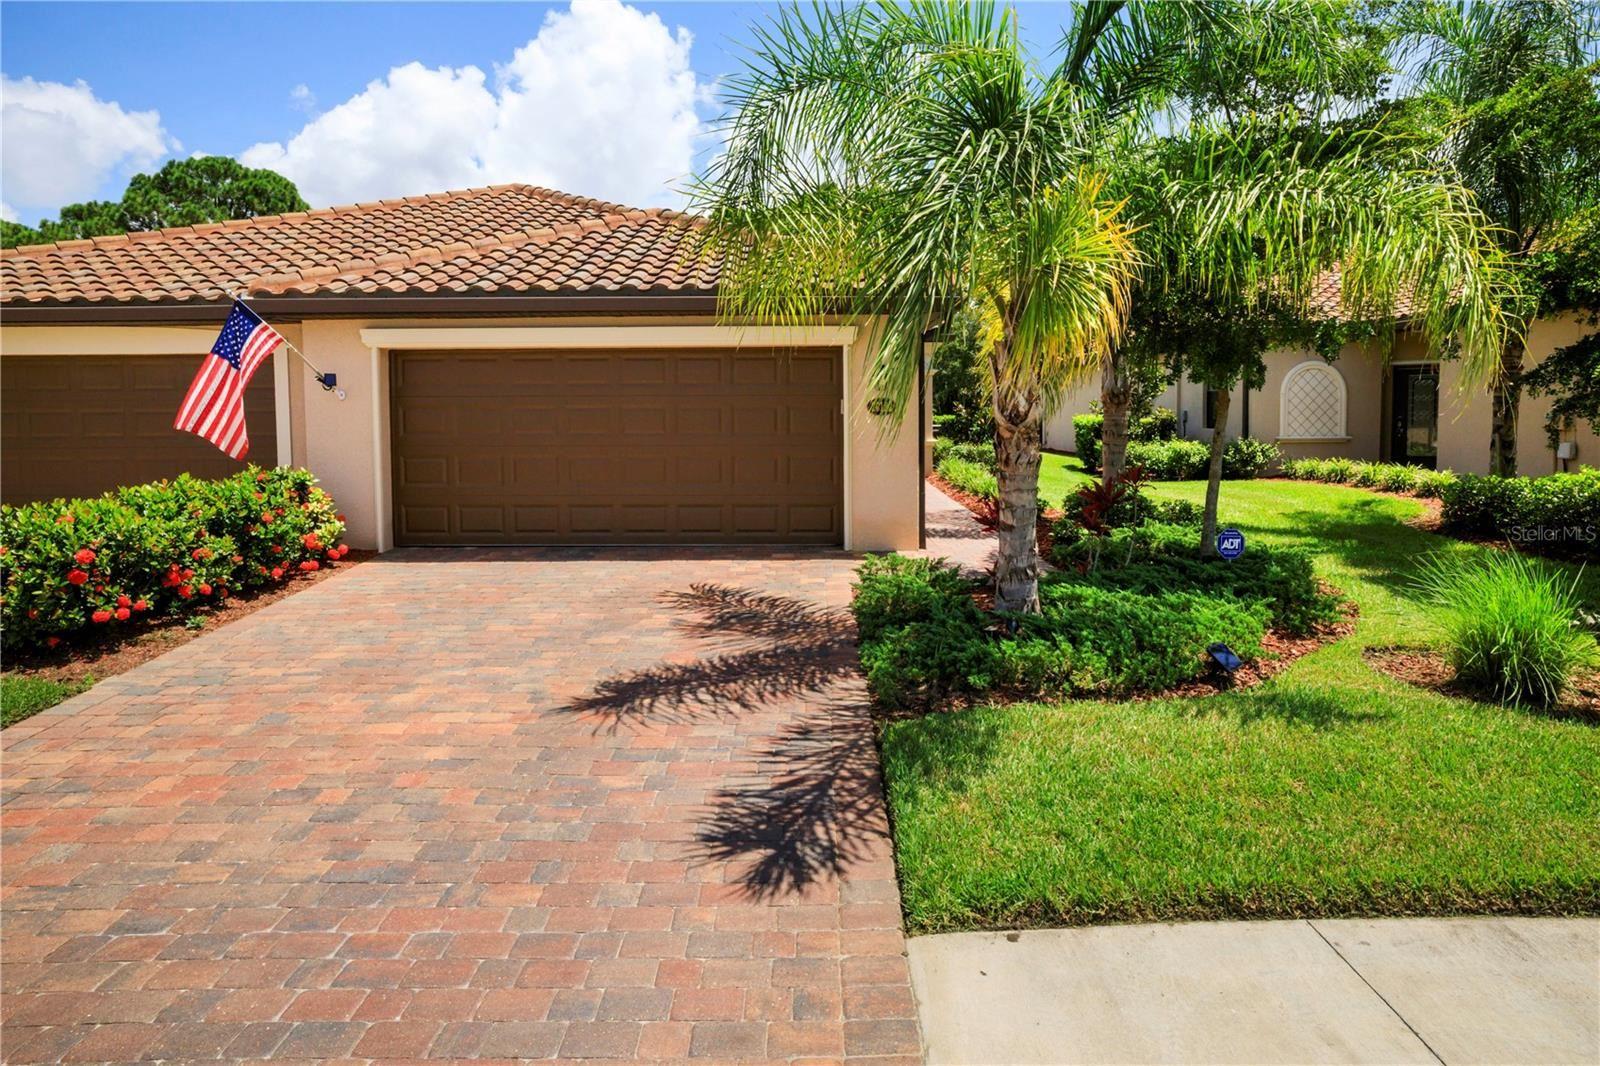 Photo of 20122 BENISSIMO DRIVE, VENICE, FL 34293 (MLS # A4509950)